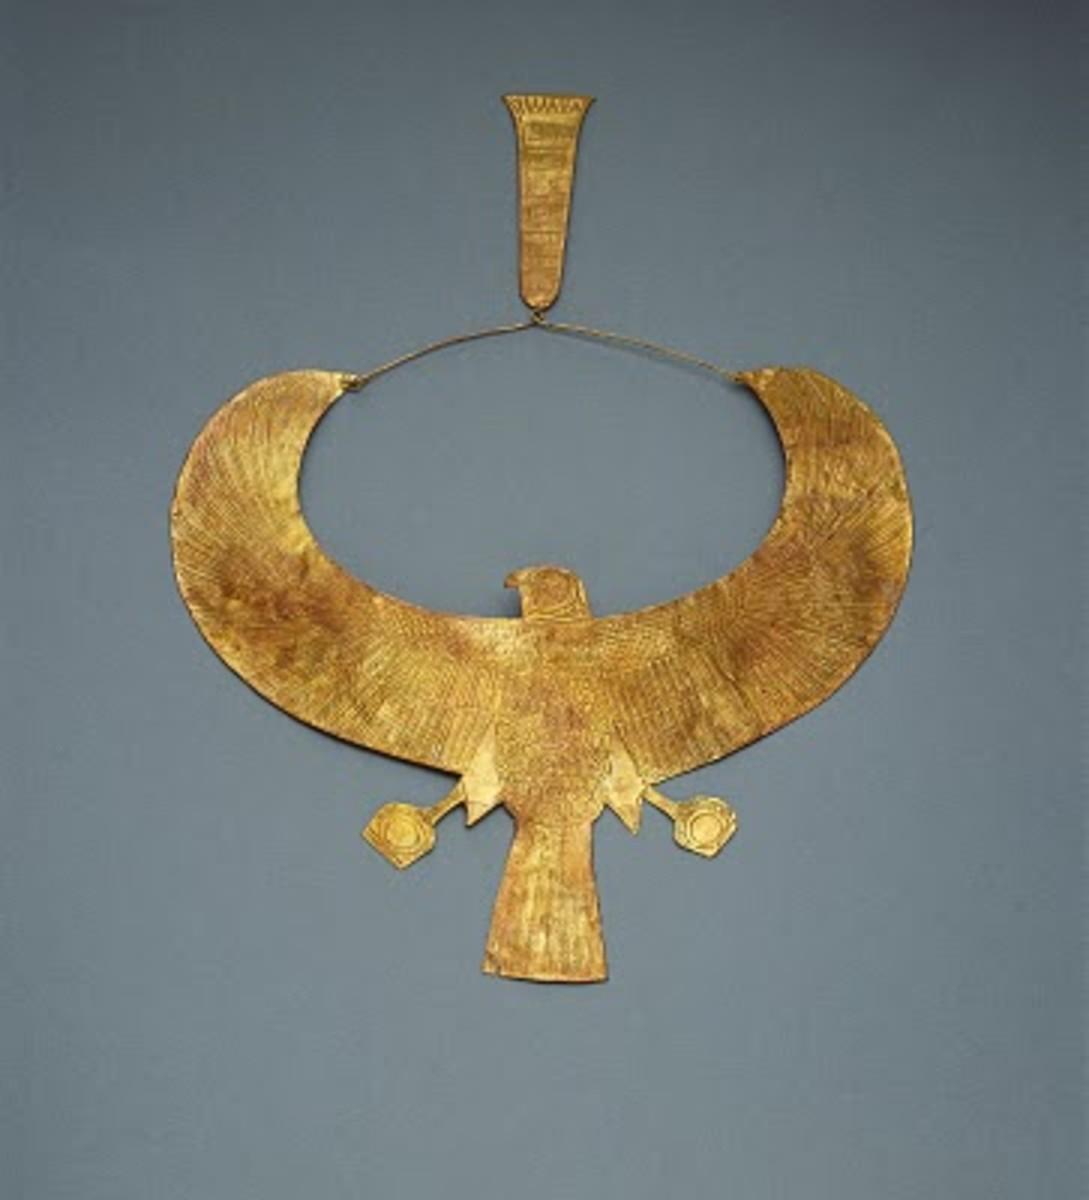 Tutankhamun's  Falcon collar found in his tomb